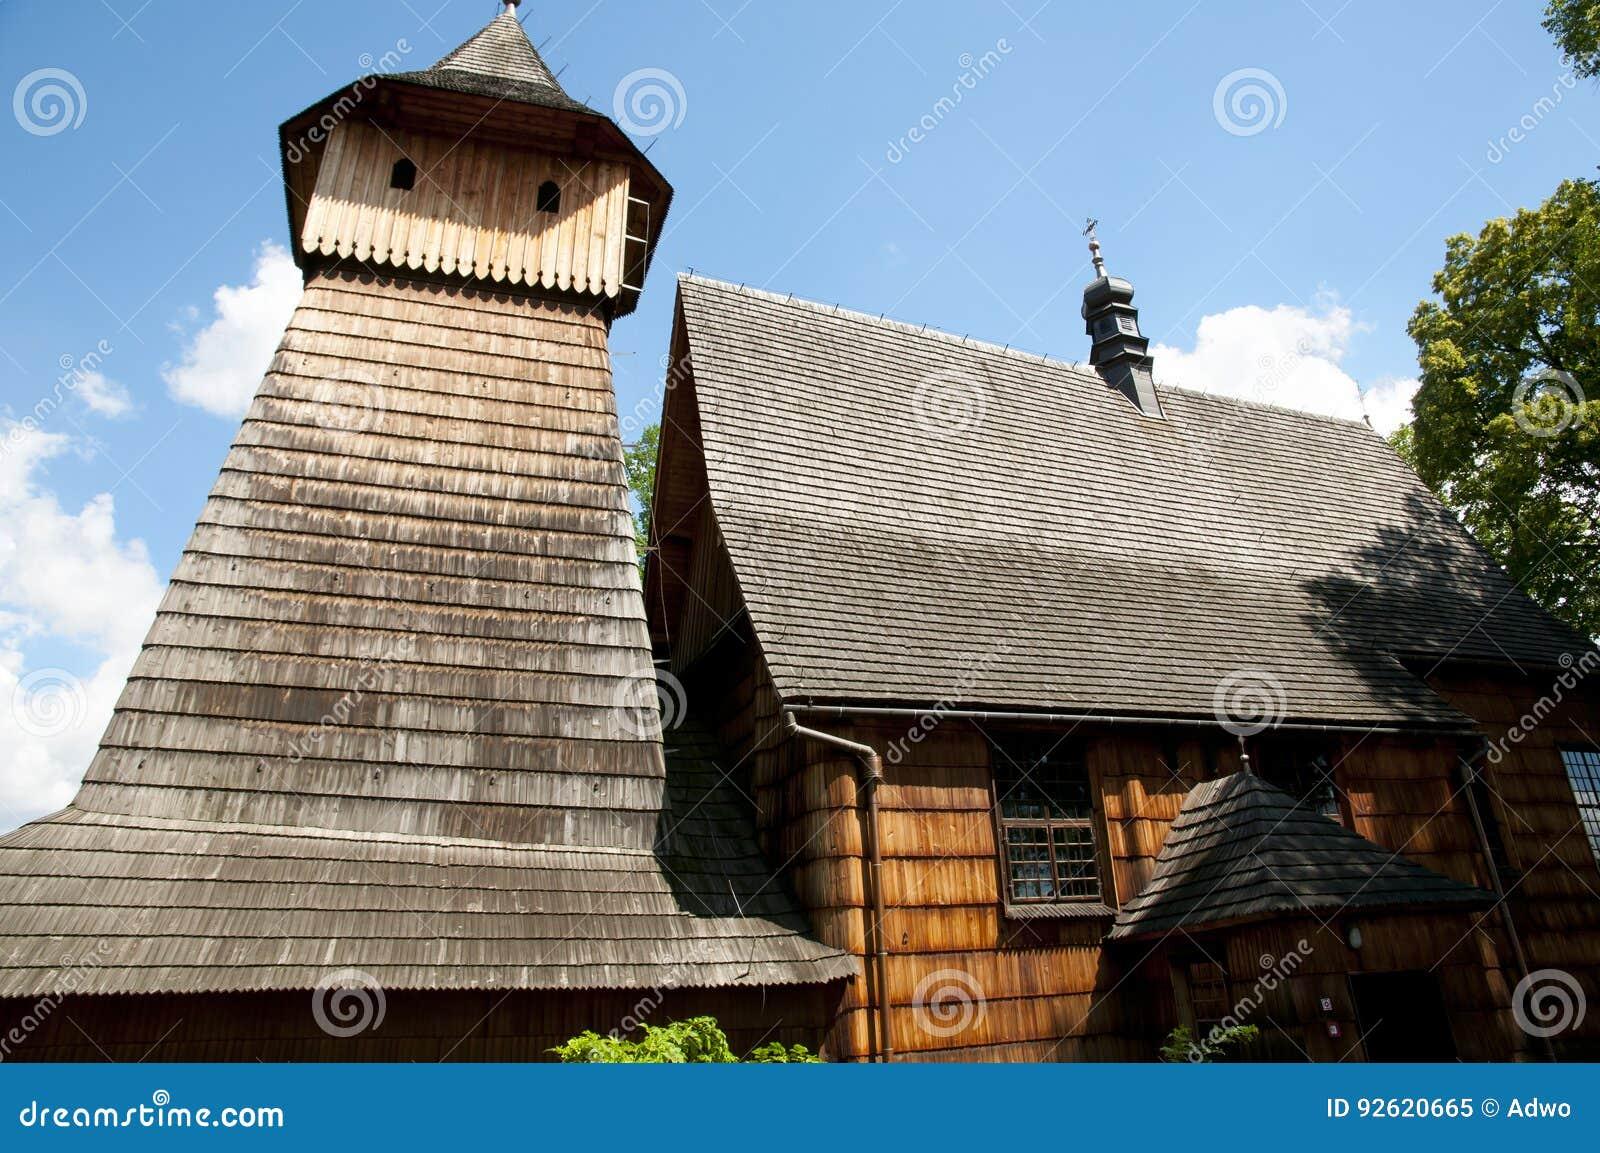 St Michael Archangel Wooden Church - Binarowa - Polonia